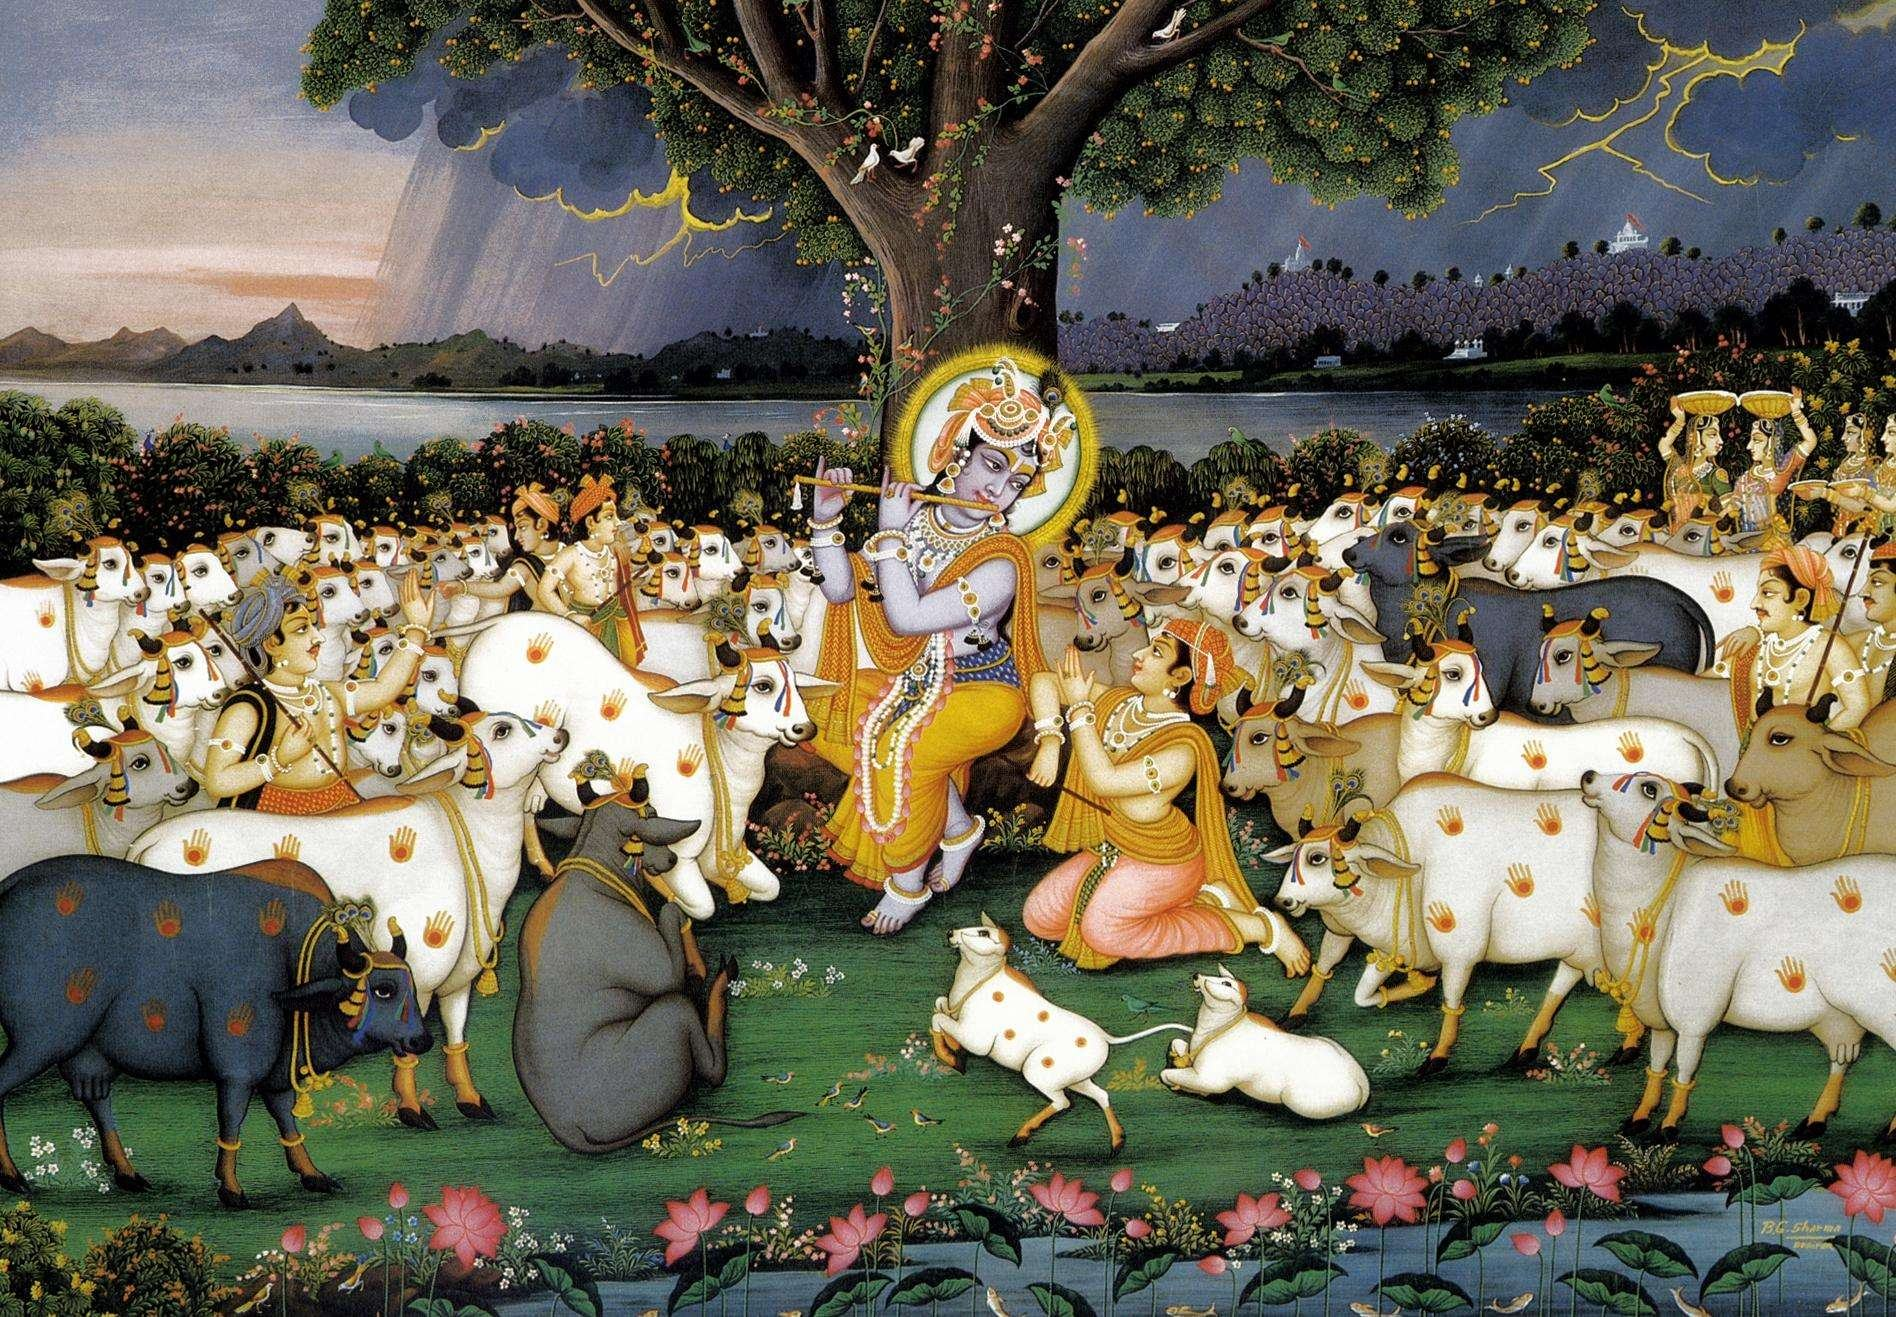 44462_Wallpapers-Radhe-Krishna-Sunday-Feast-Bhajans-Surya-Kanya-Devi-Dasi_1896x1317